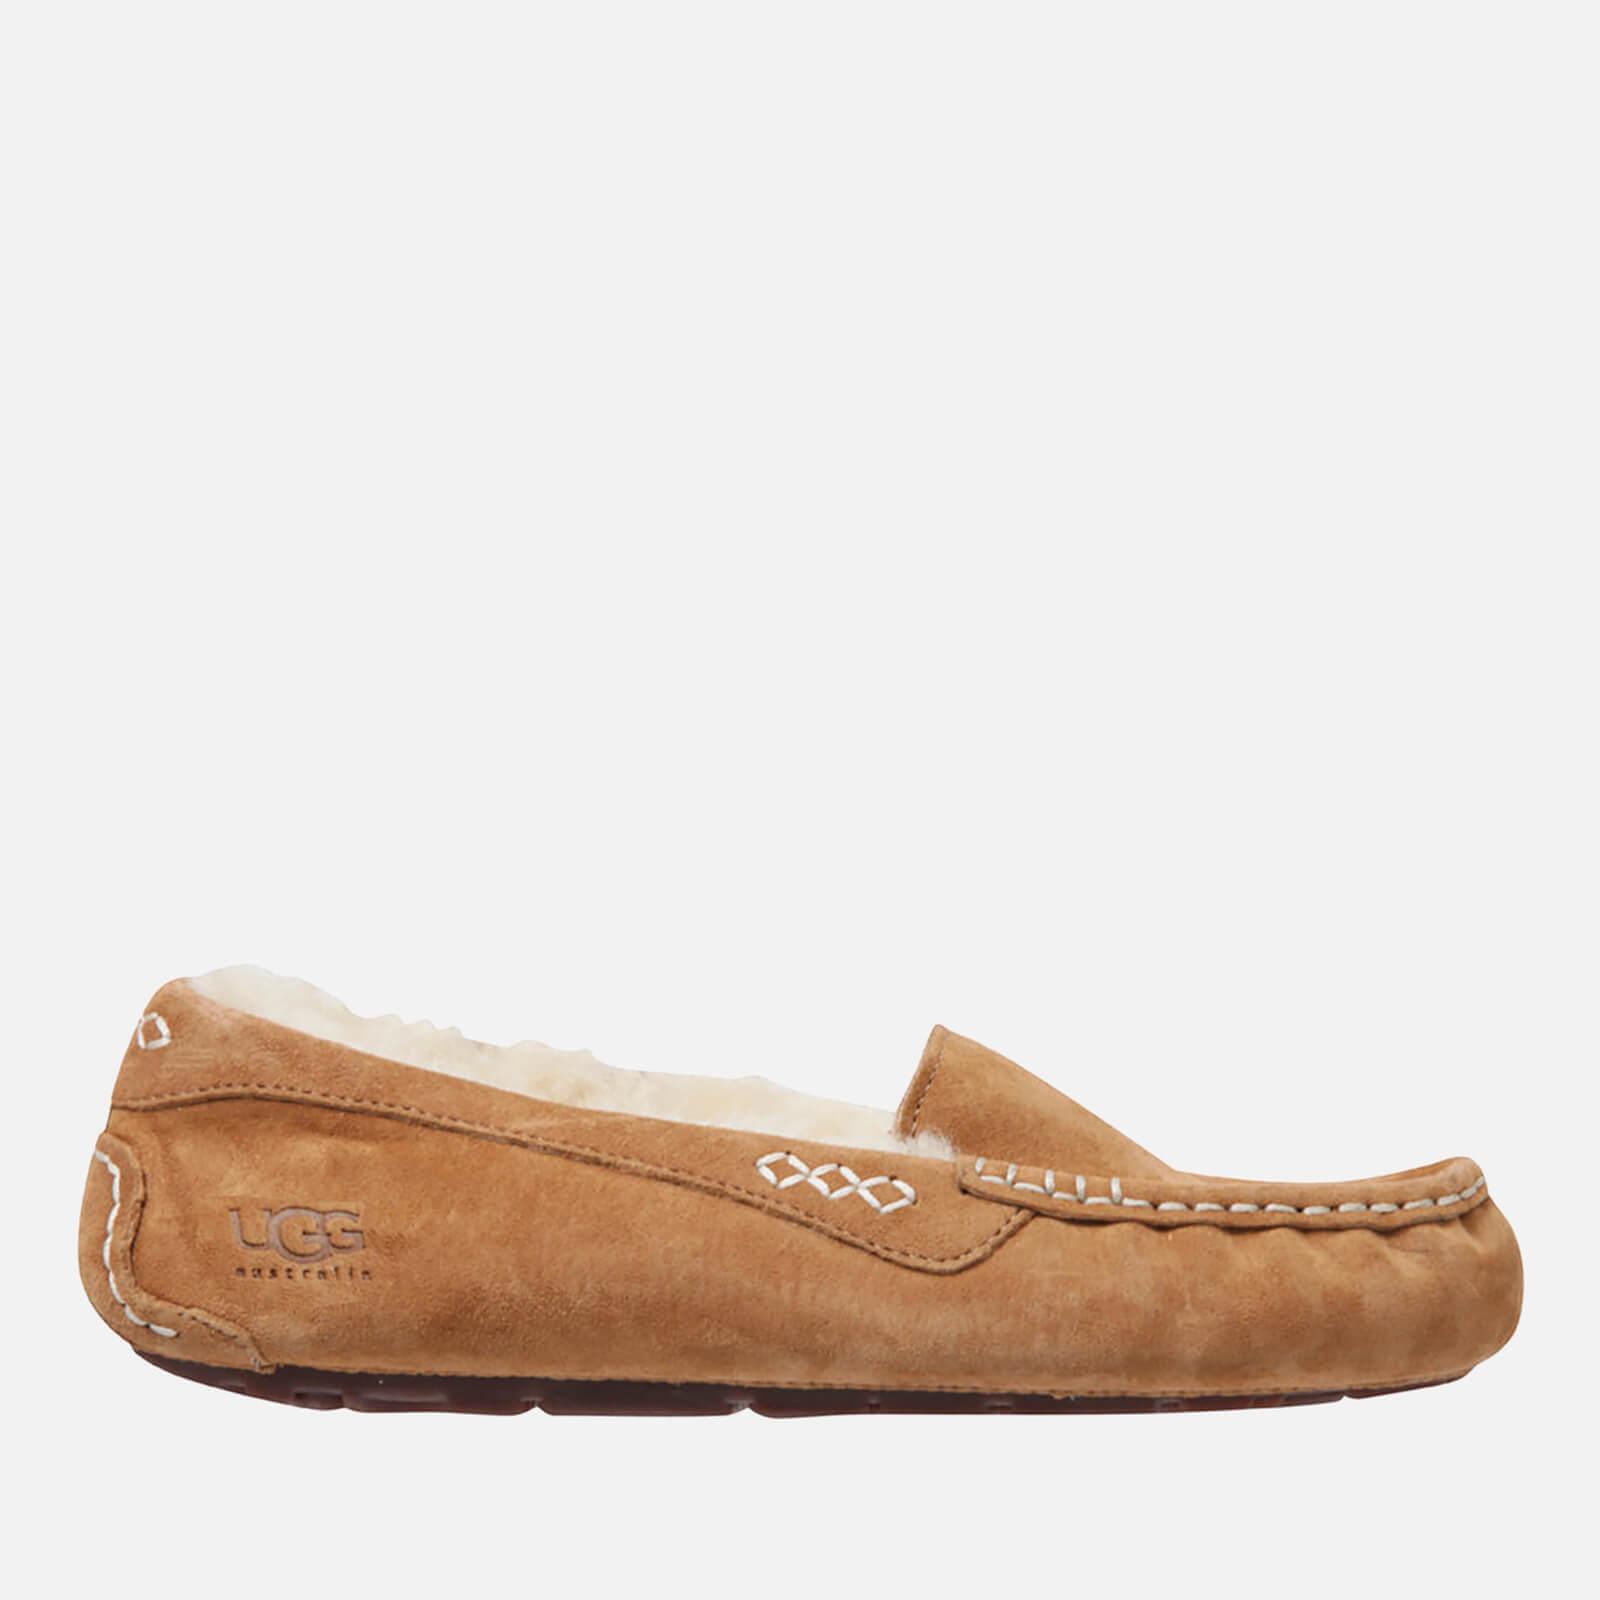 UGG Women's Ansley Moccasin Suede Slippers - Chestnut - UK 8